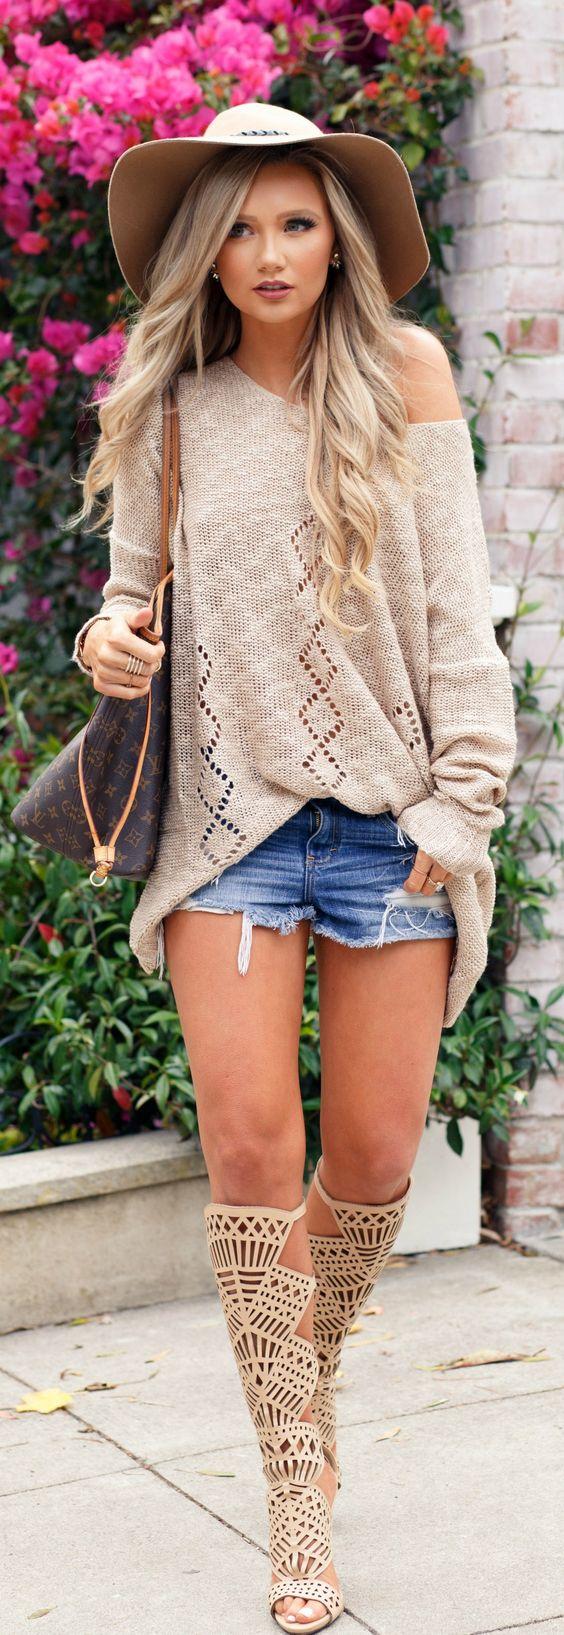 Fall Knits // Fashion Look by Stephanie Danielle